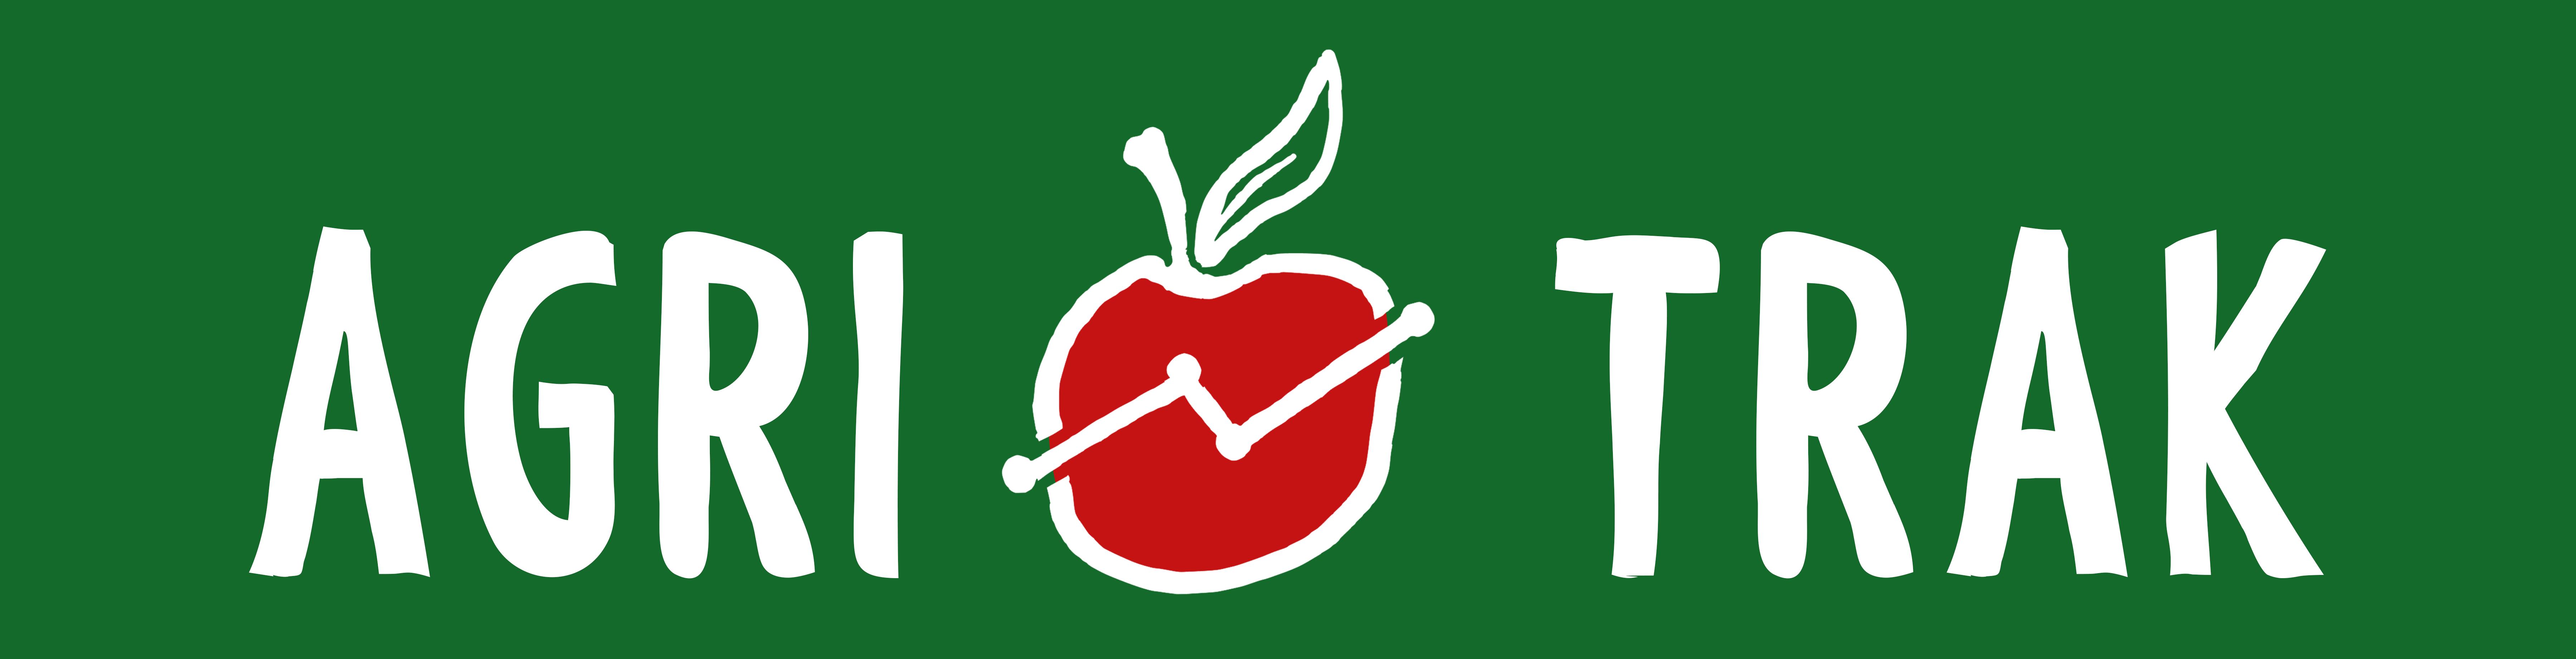 Agri-Trak | Farm Management & Tracking Software